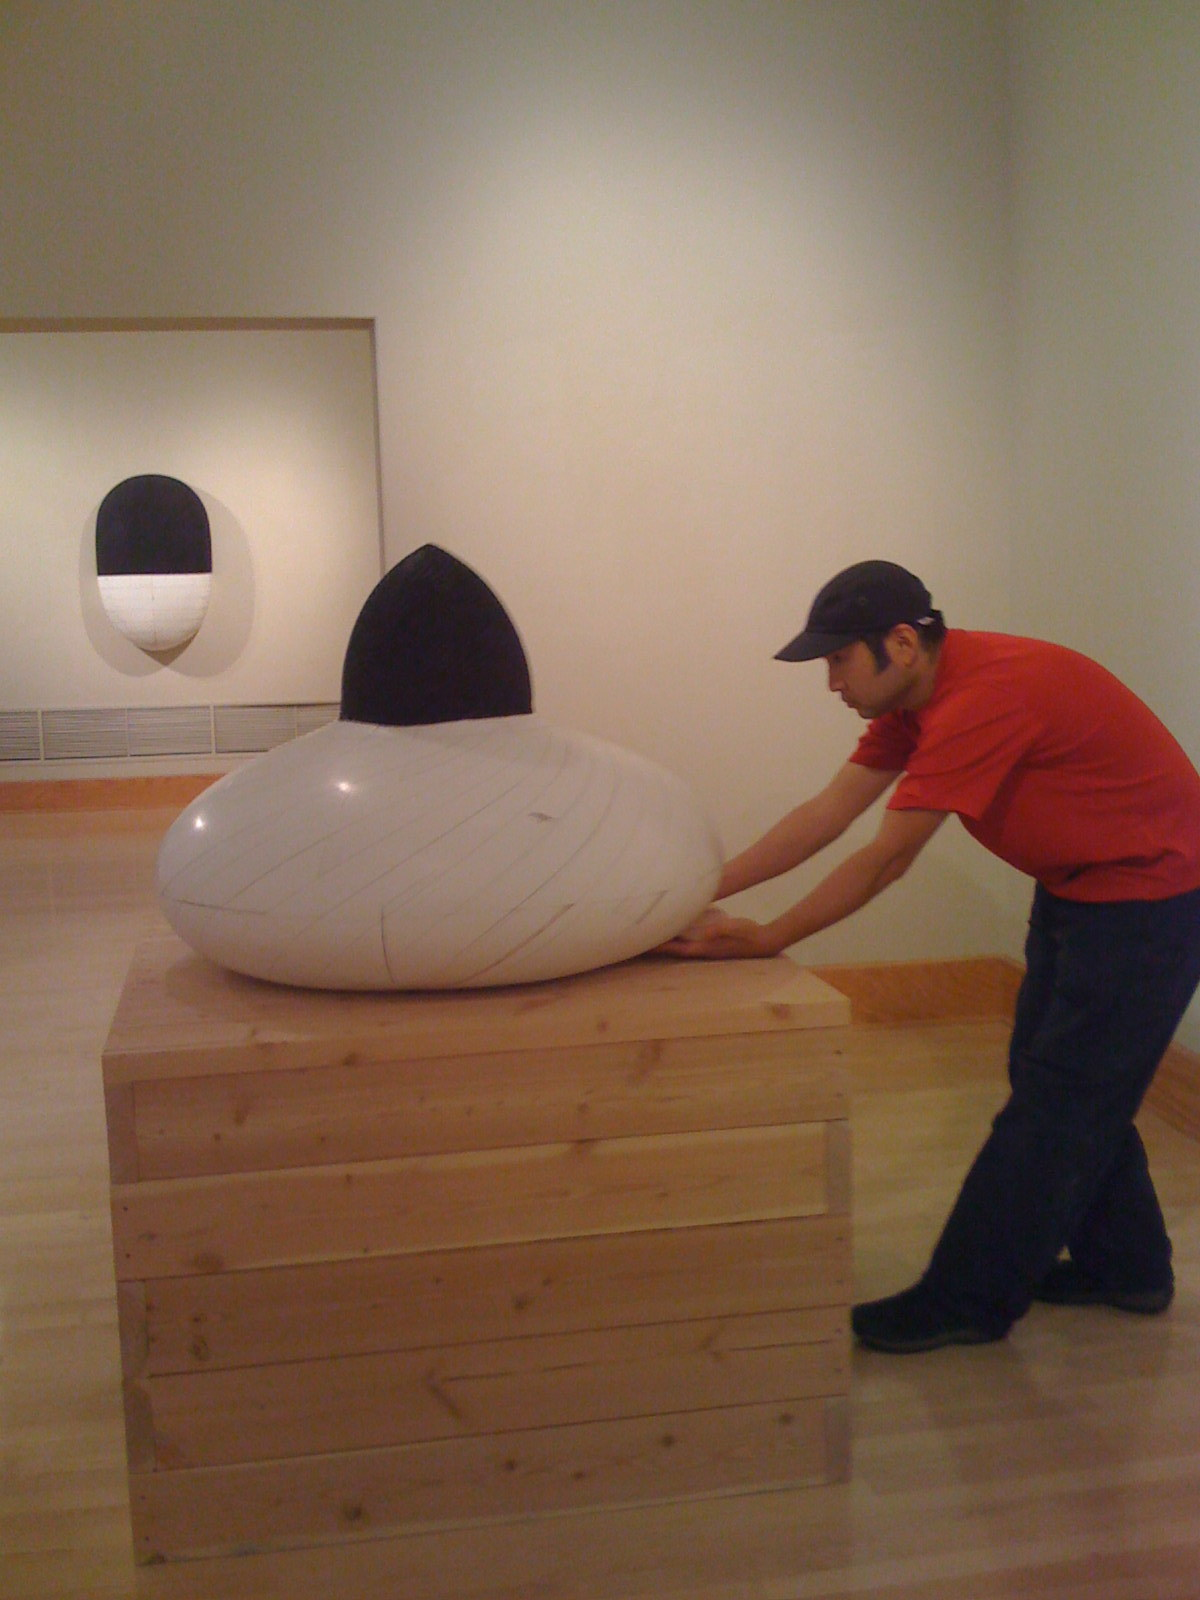 Hiroyuki Hamada installing his sculpture in the List Gallery, Swarthmore College